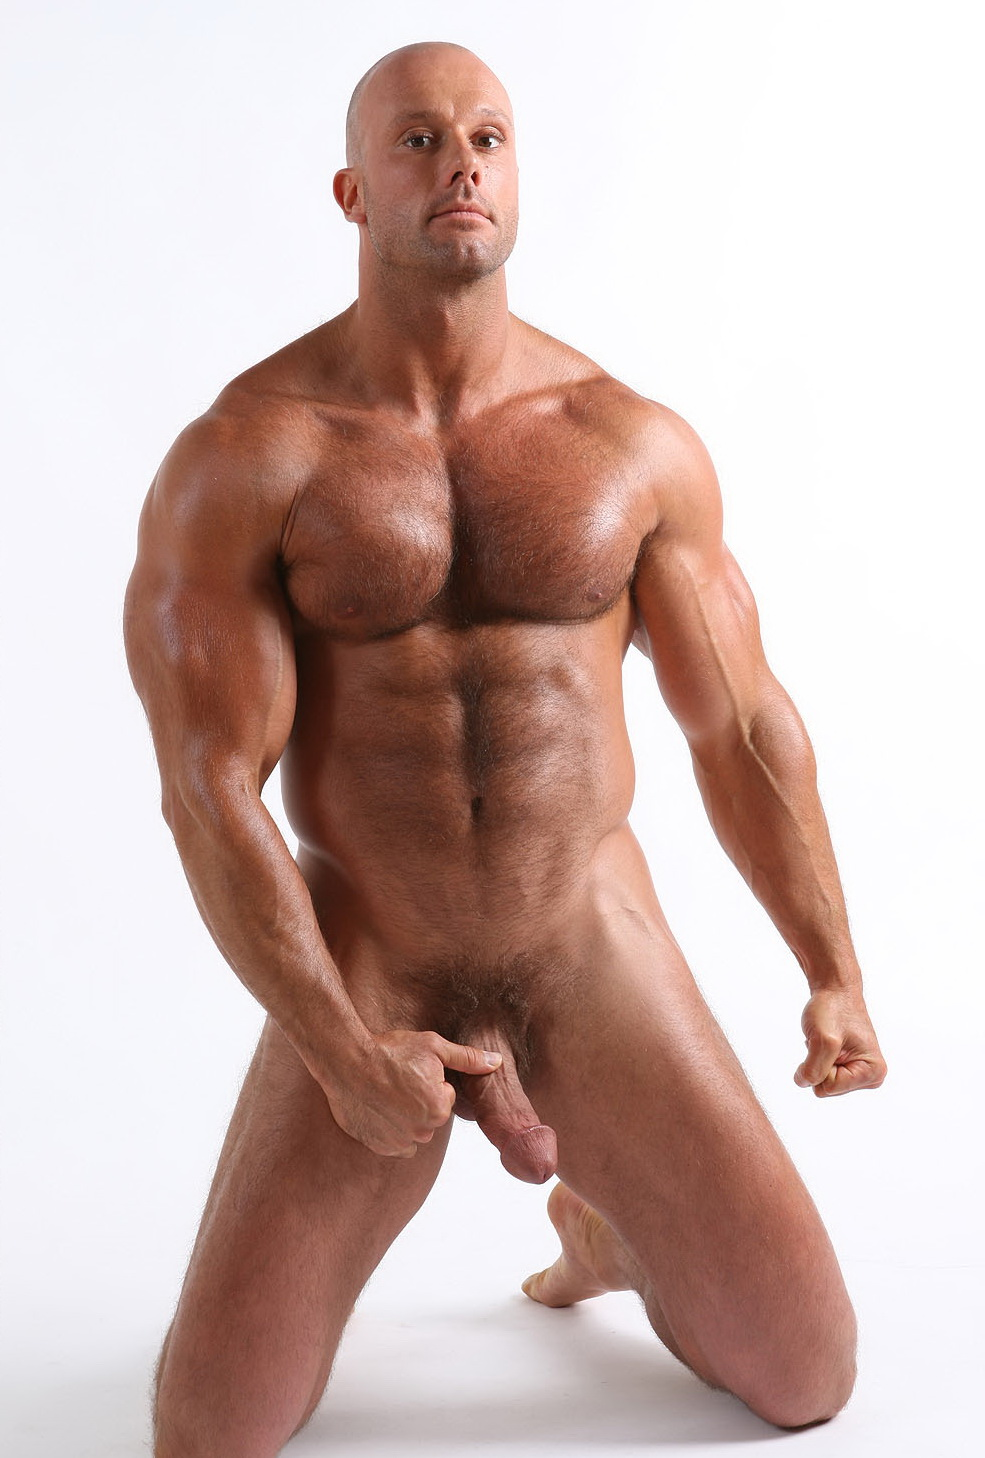 Gay man bubble butt